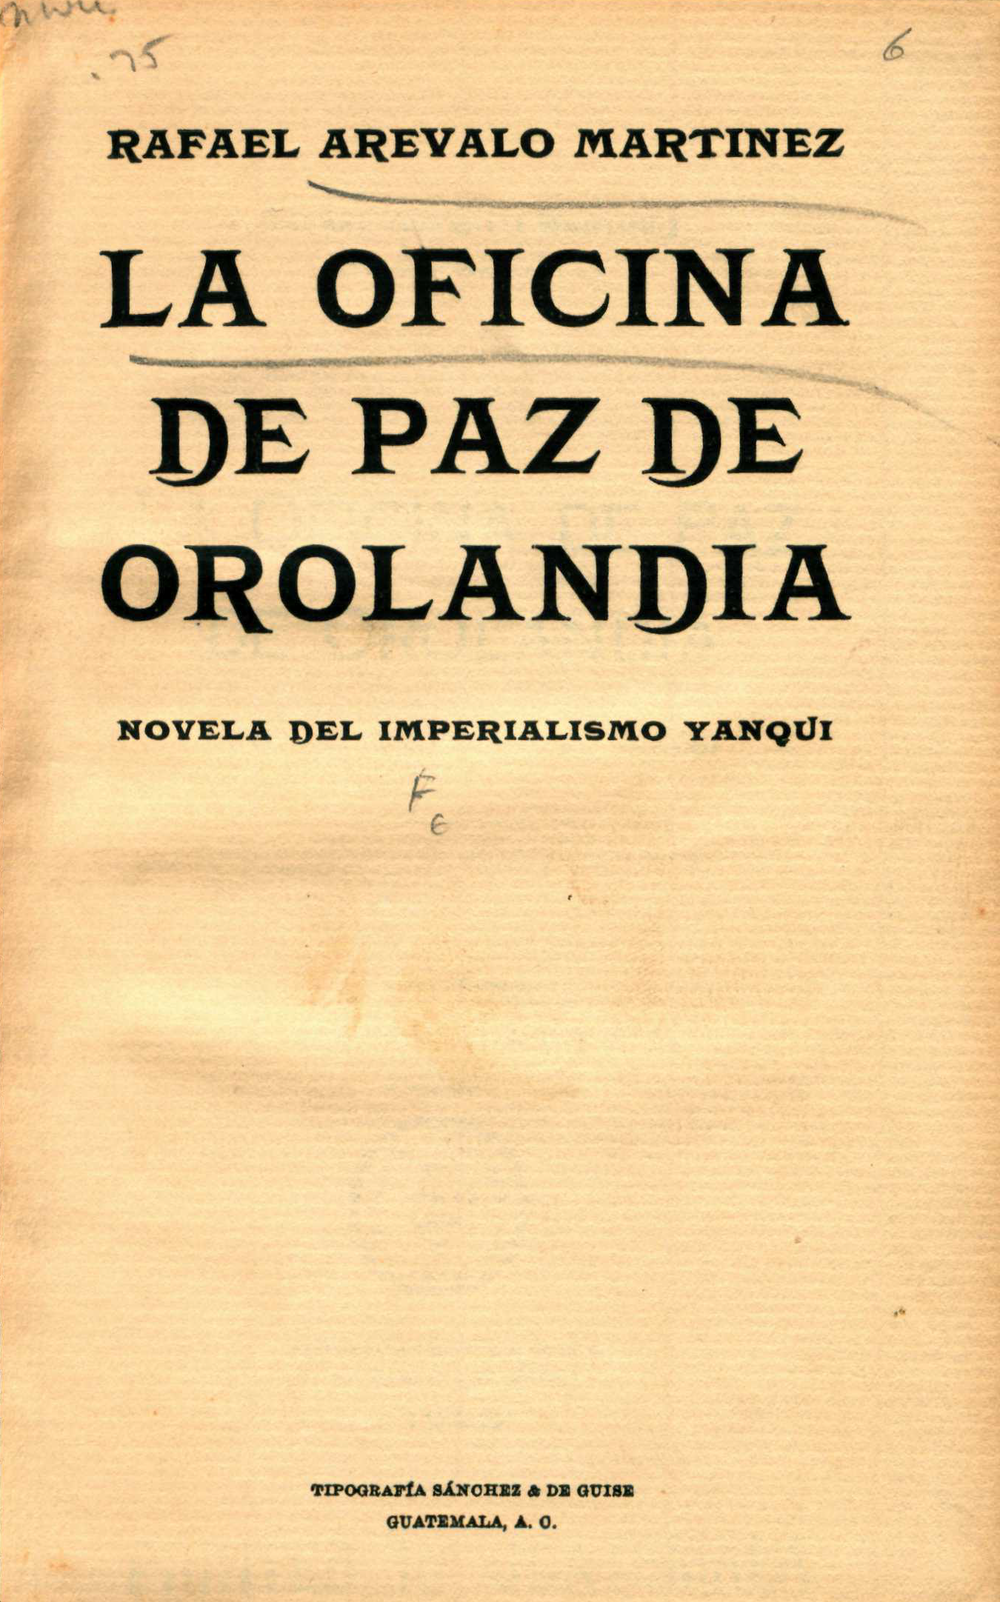 Original cover to the library copy I read.